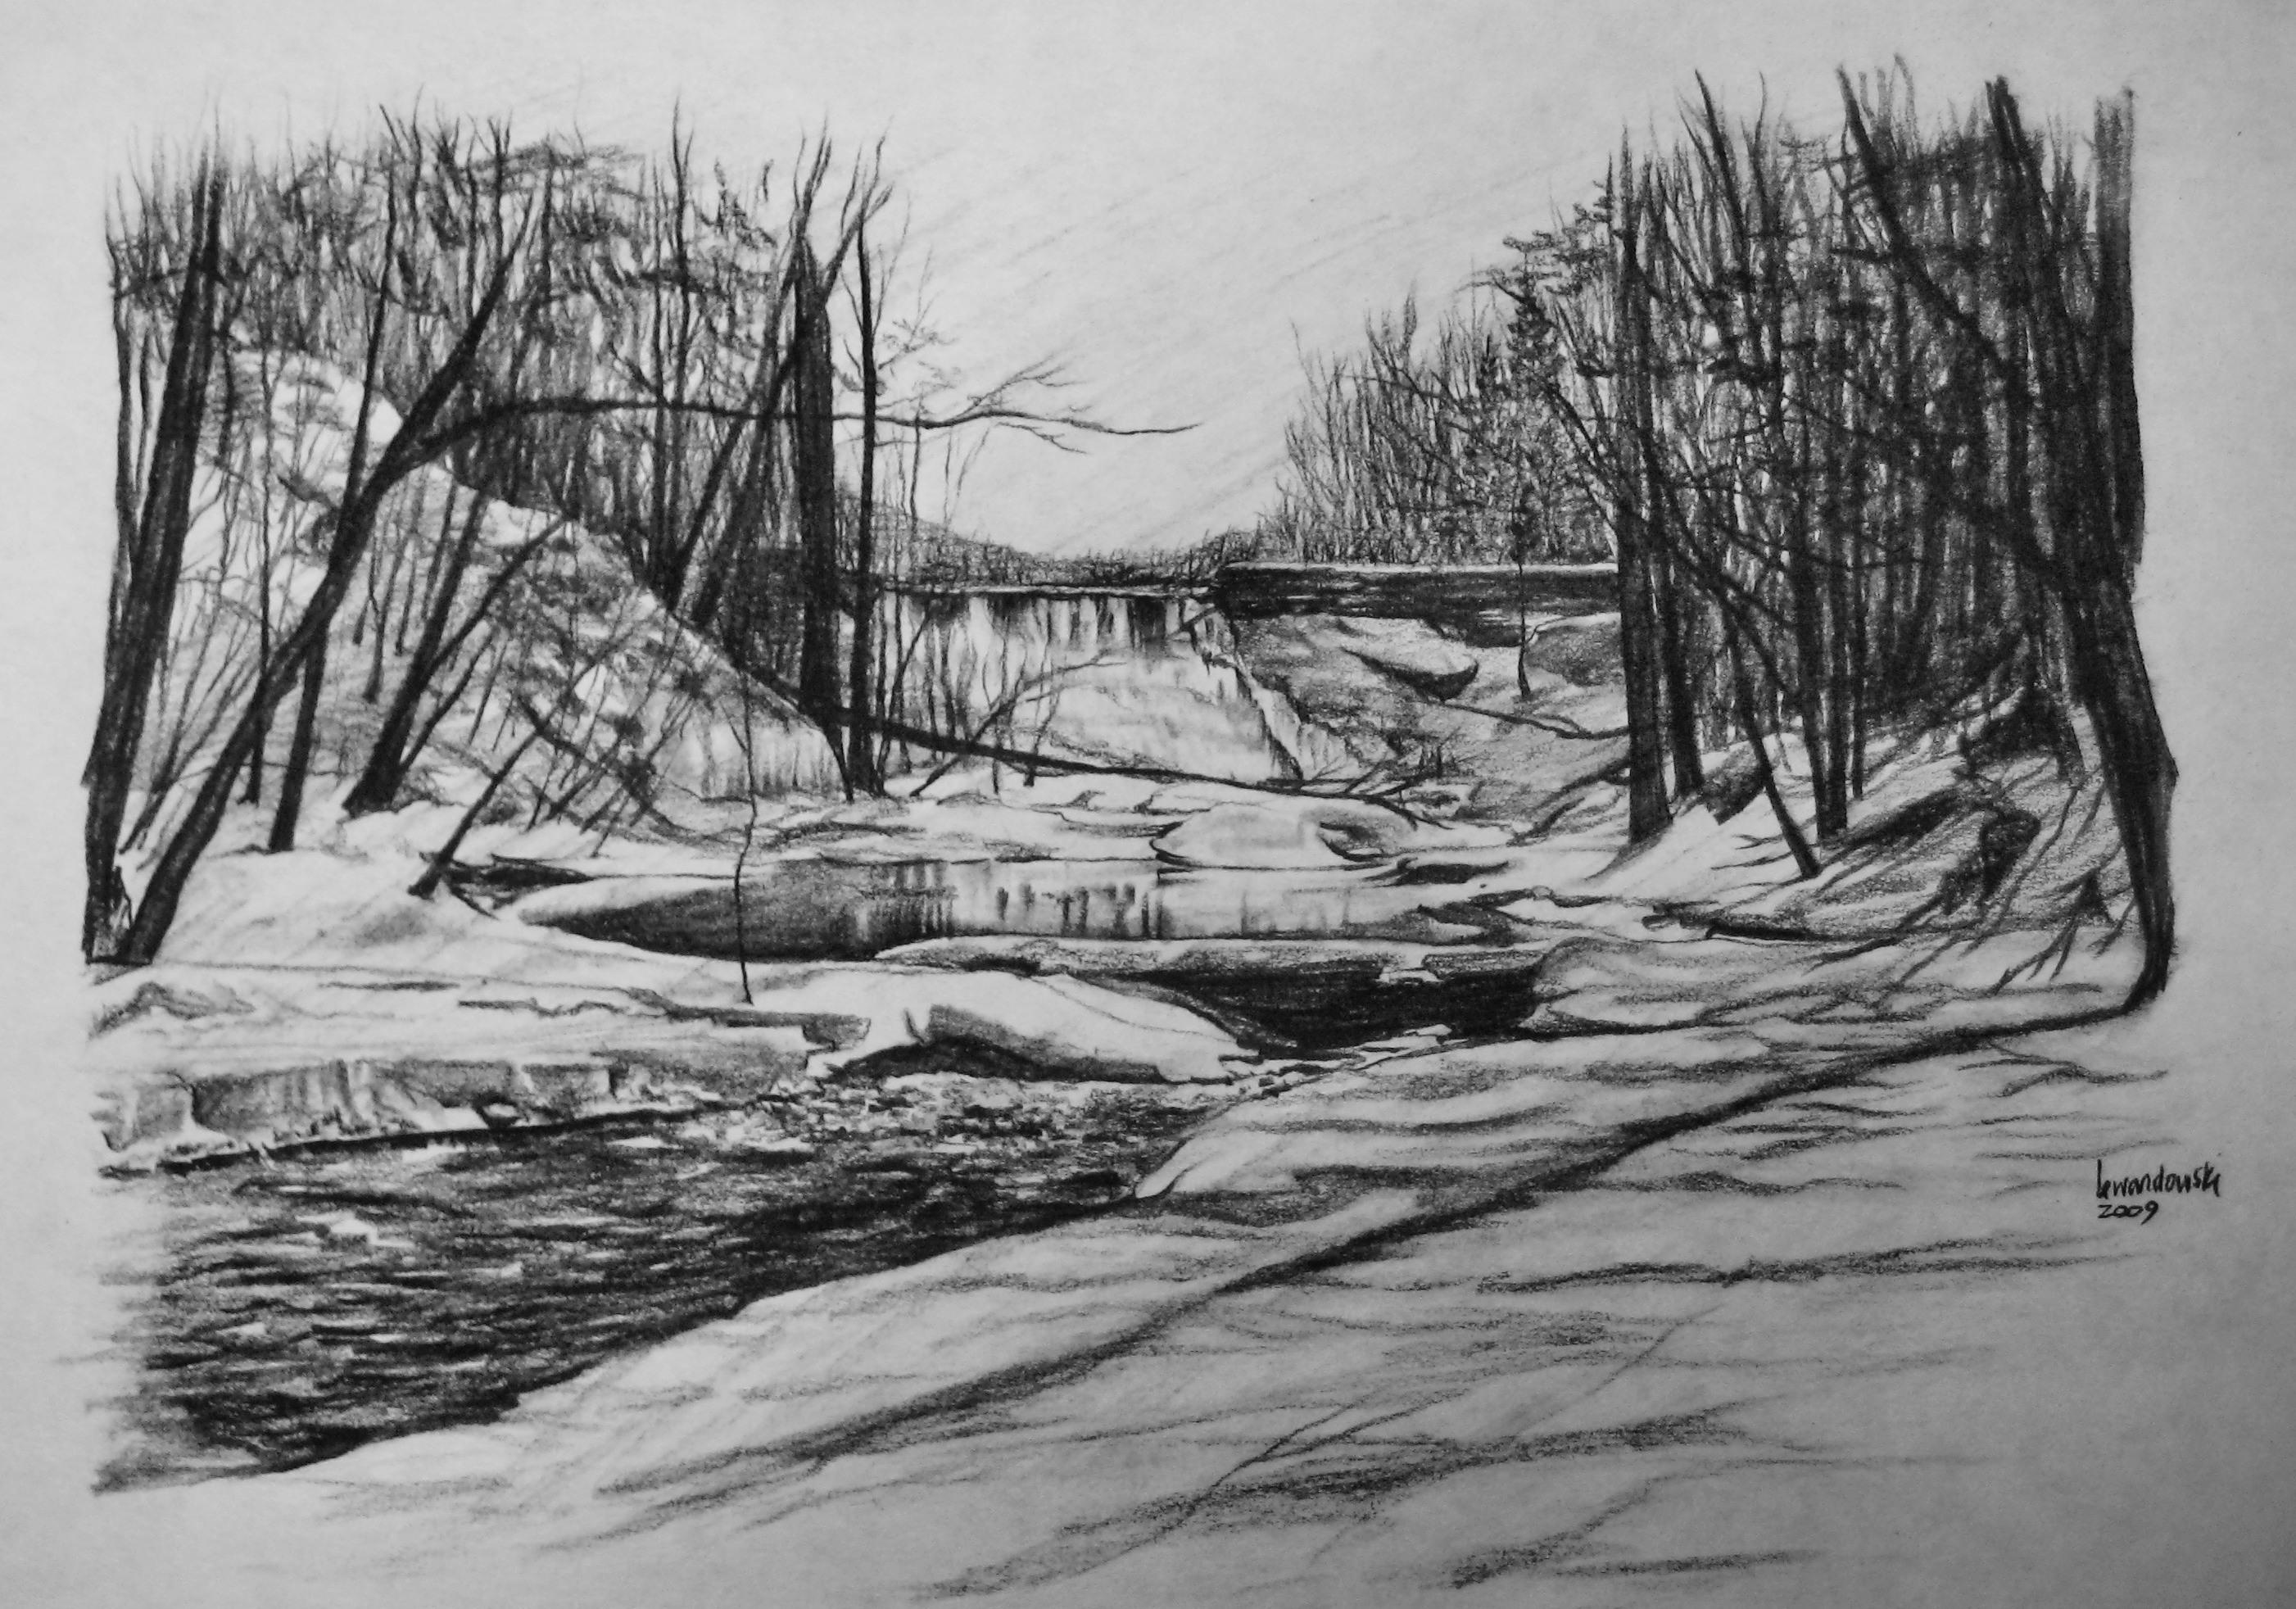 landscape charcoal sketches - photo #21